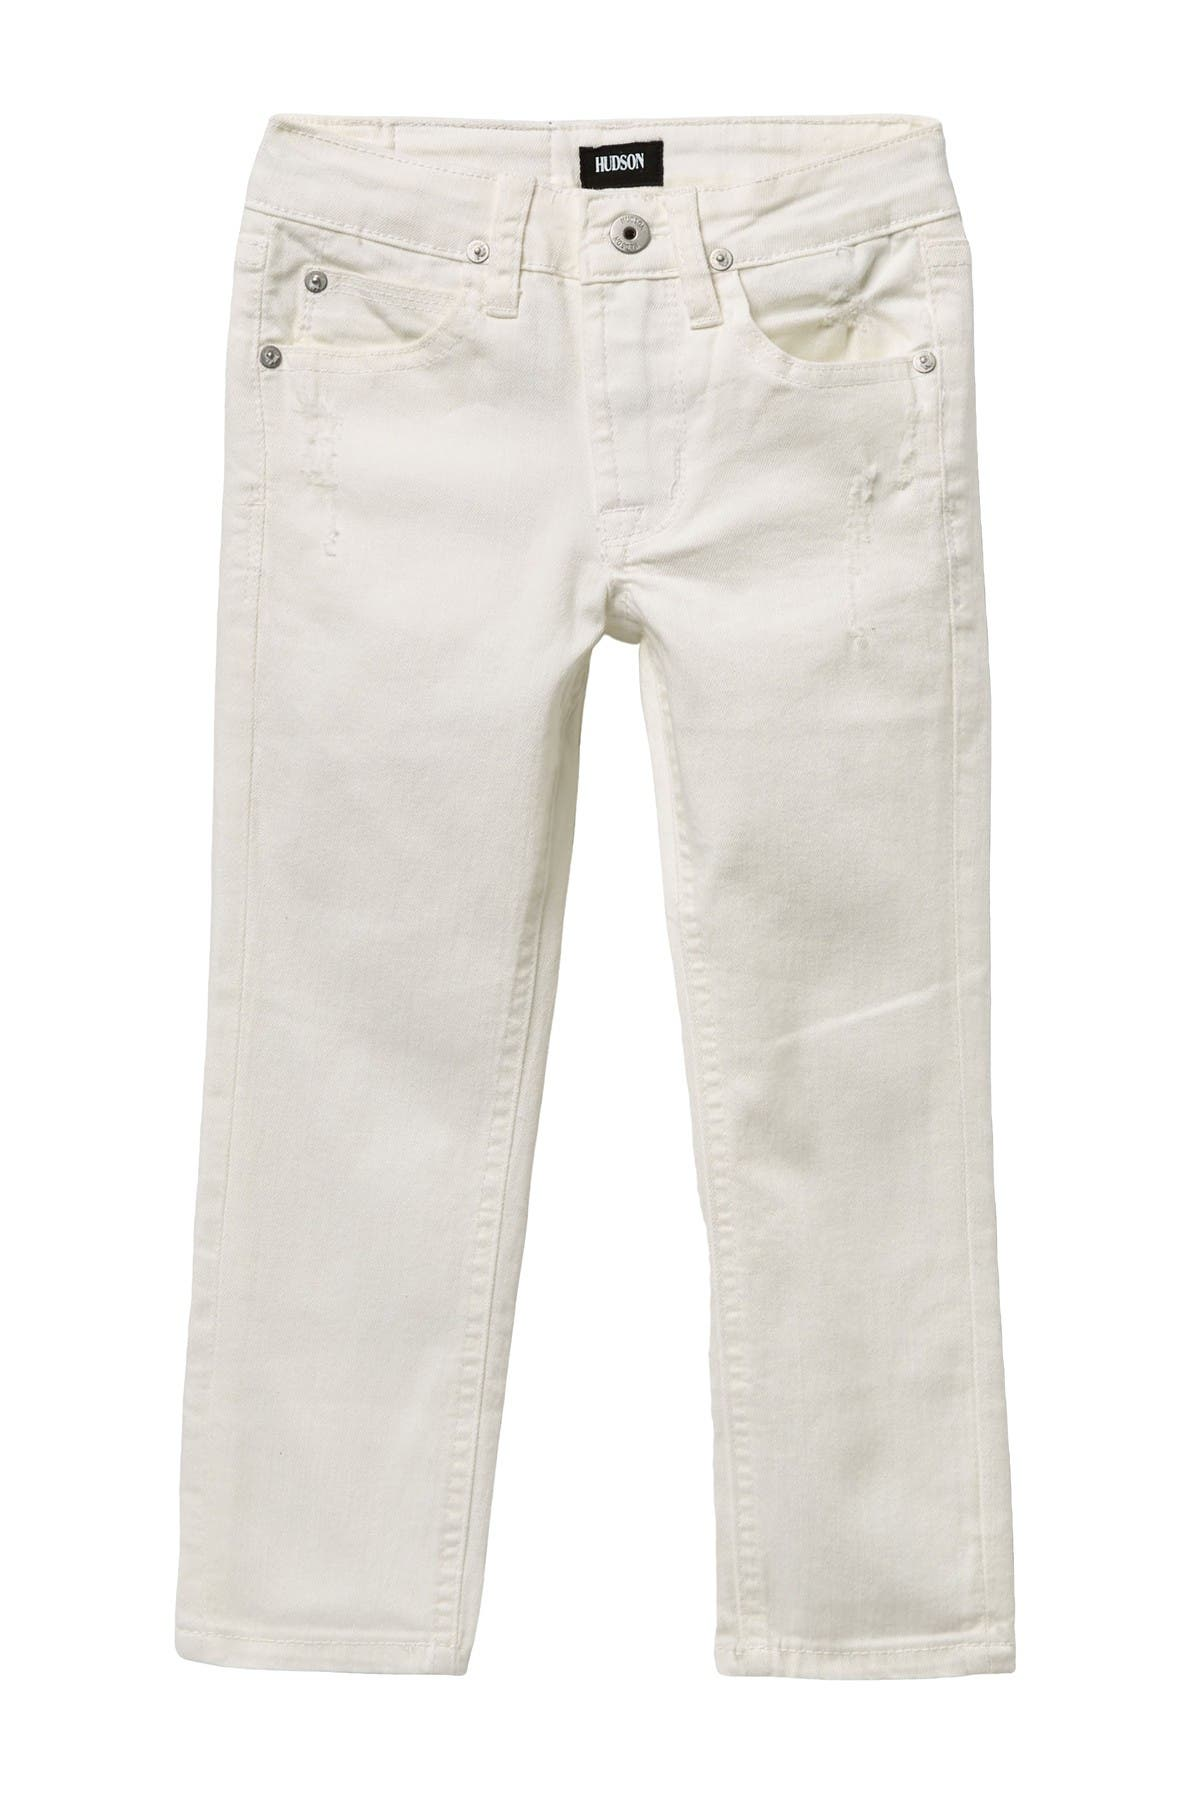 Image of HUDSON Jeans Straight Leg Jeans